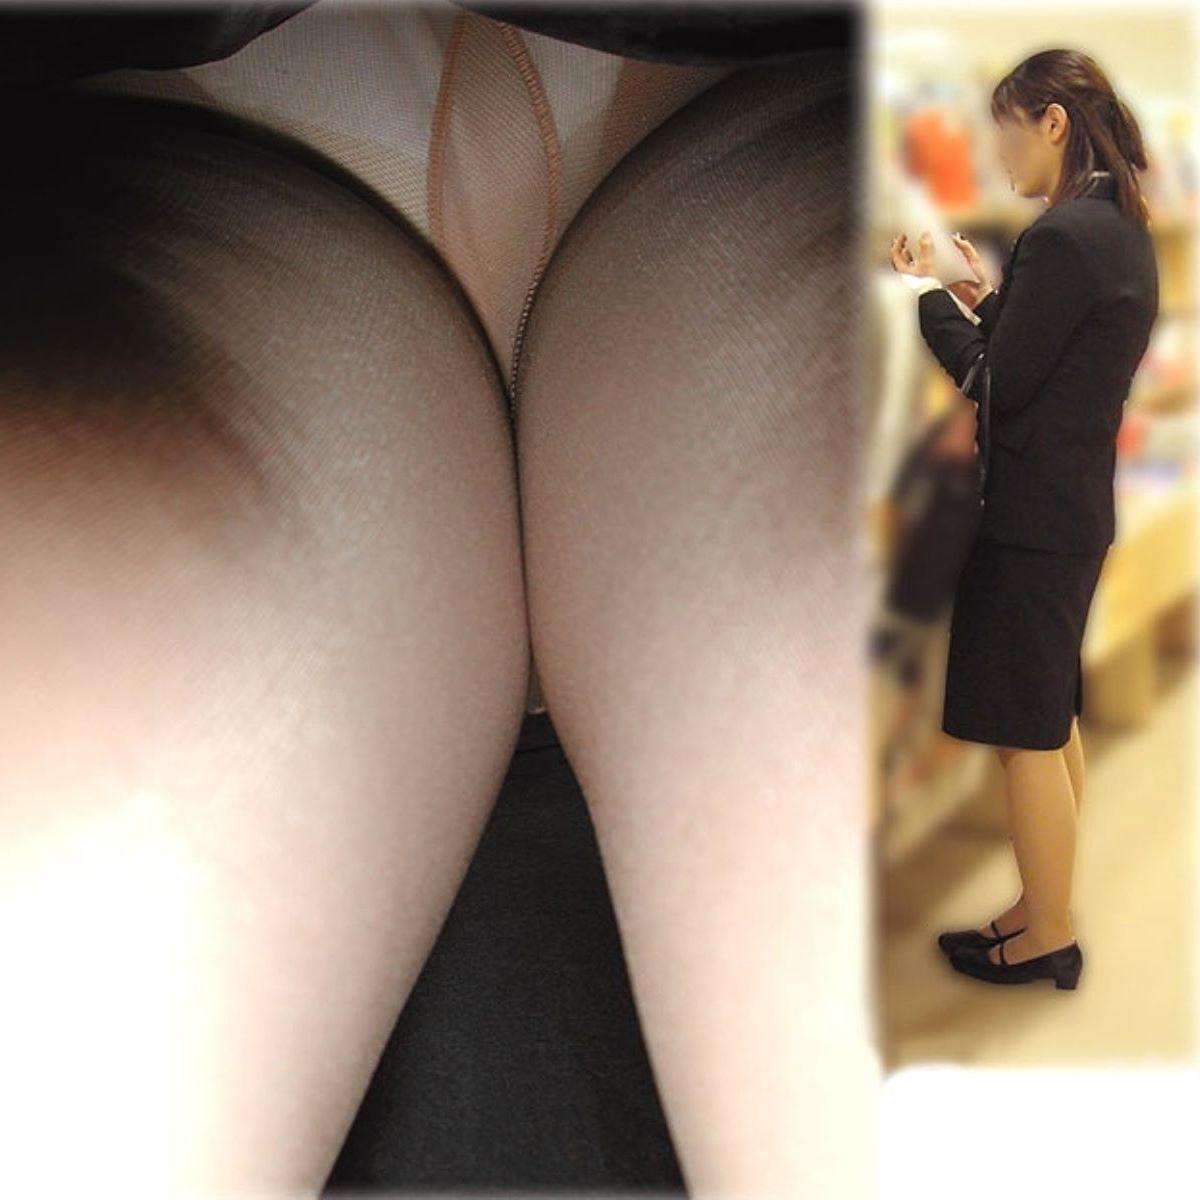 OLのタイトスカート内の生理下着逆さ盗撮エロ画像12枚目